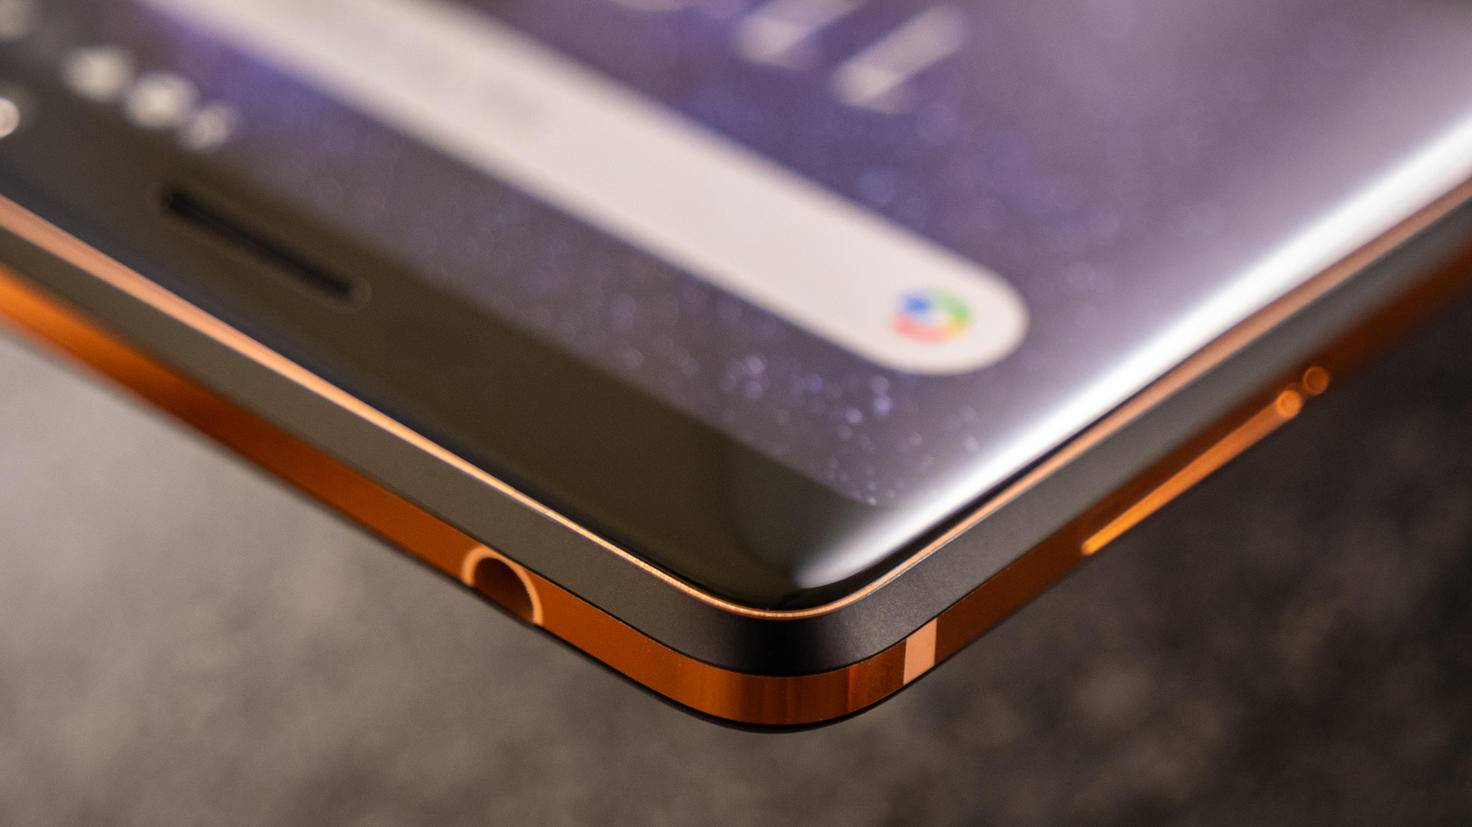 Nokia-7-Plus-Klinkenanschluss-TURN-ON